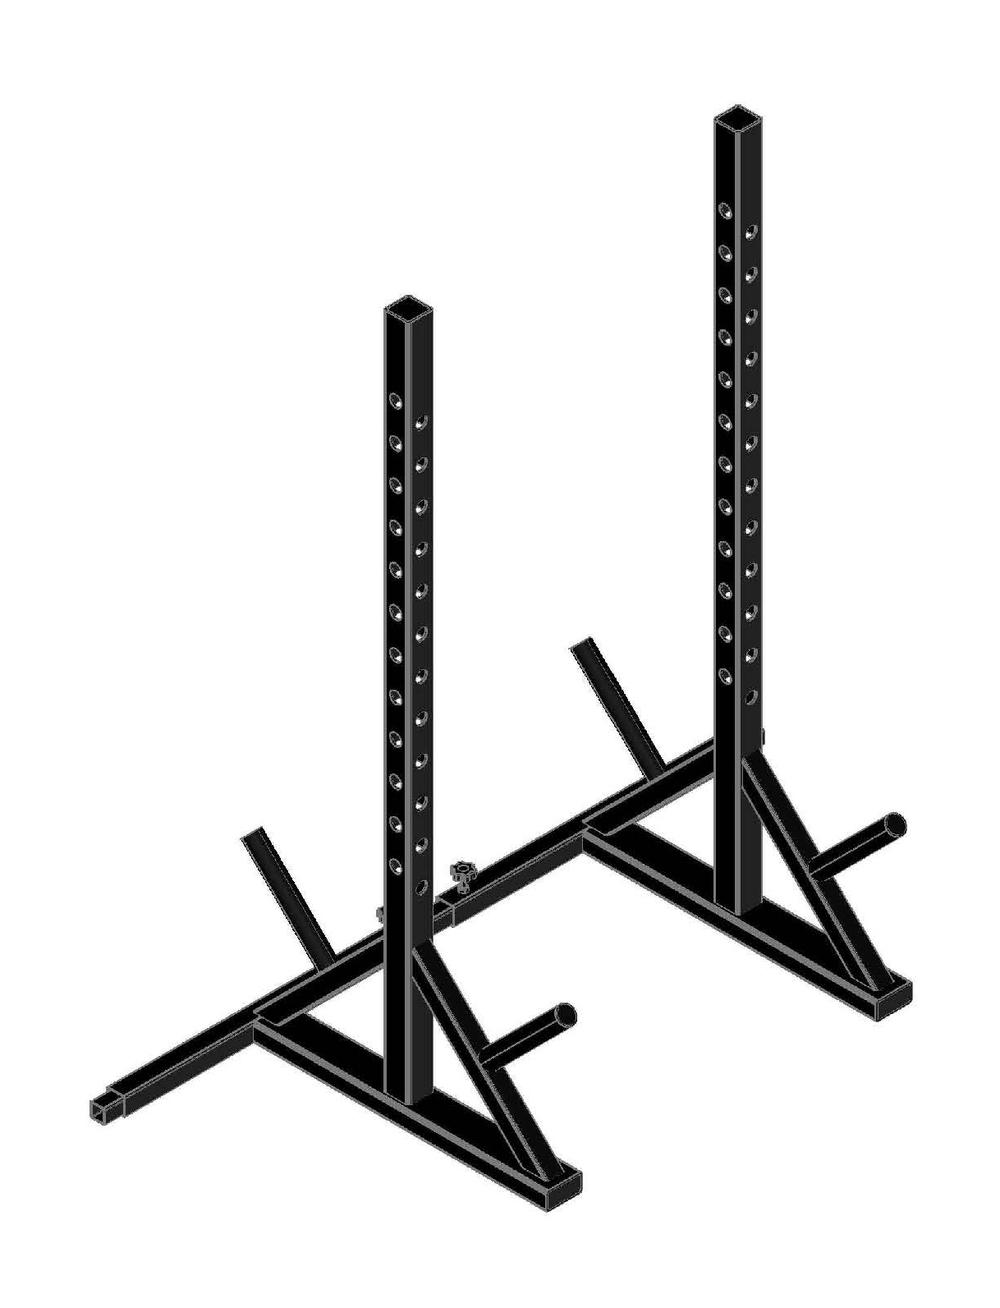 Adjustable Squat Rack Main Image